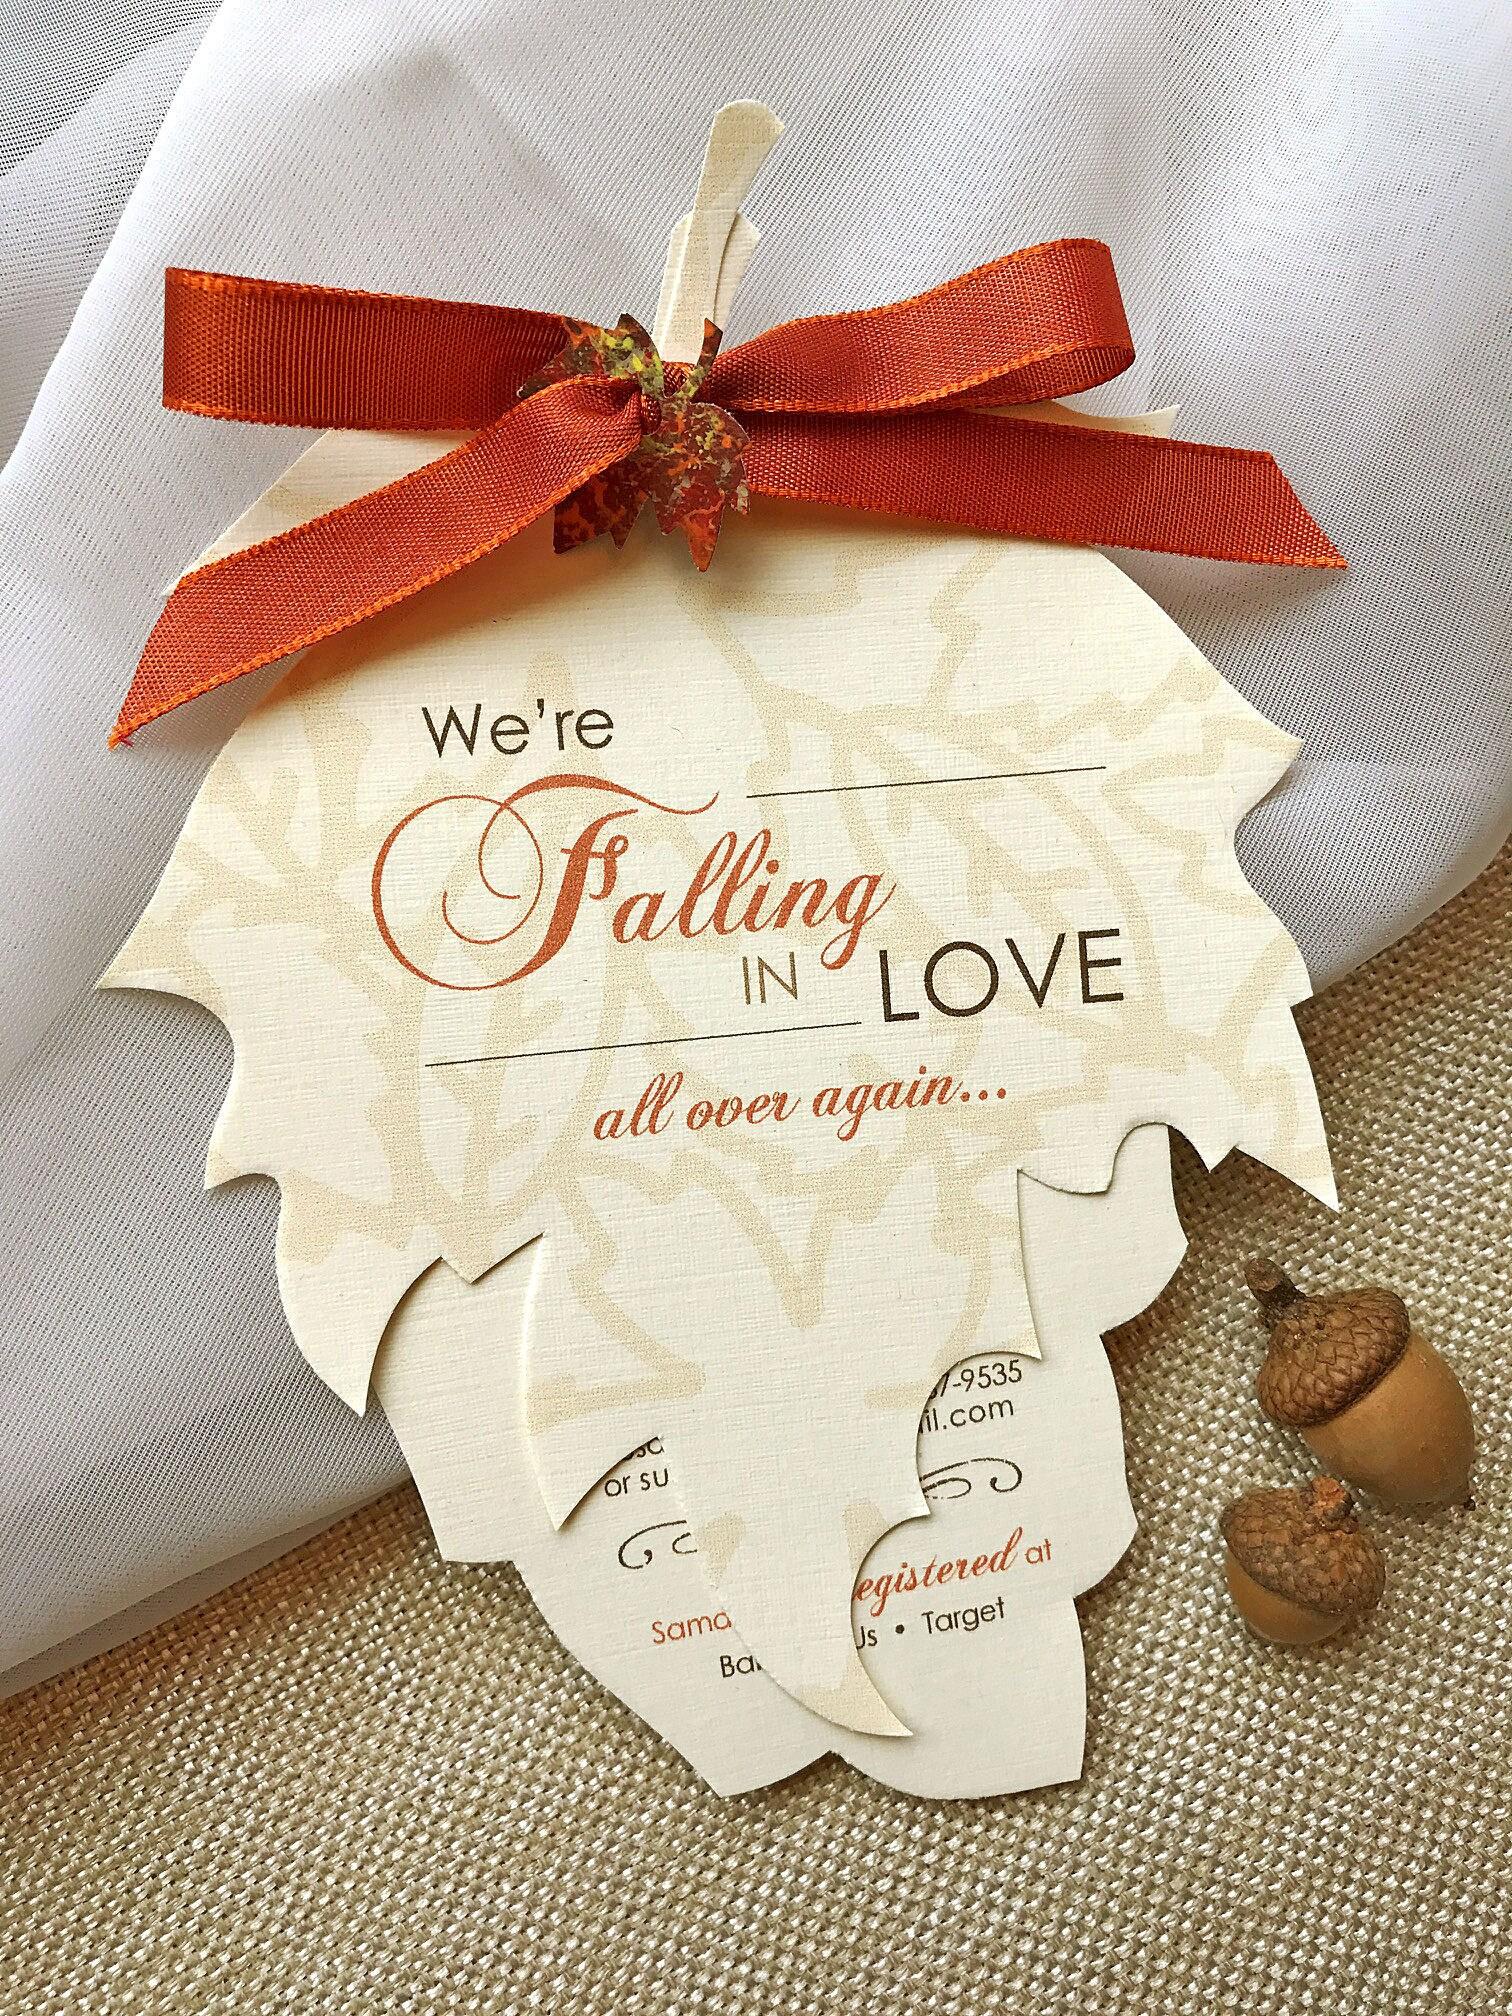 Amazing Fall In Love Wedding Favors | Wedding